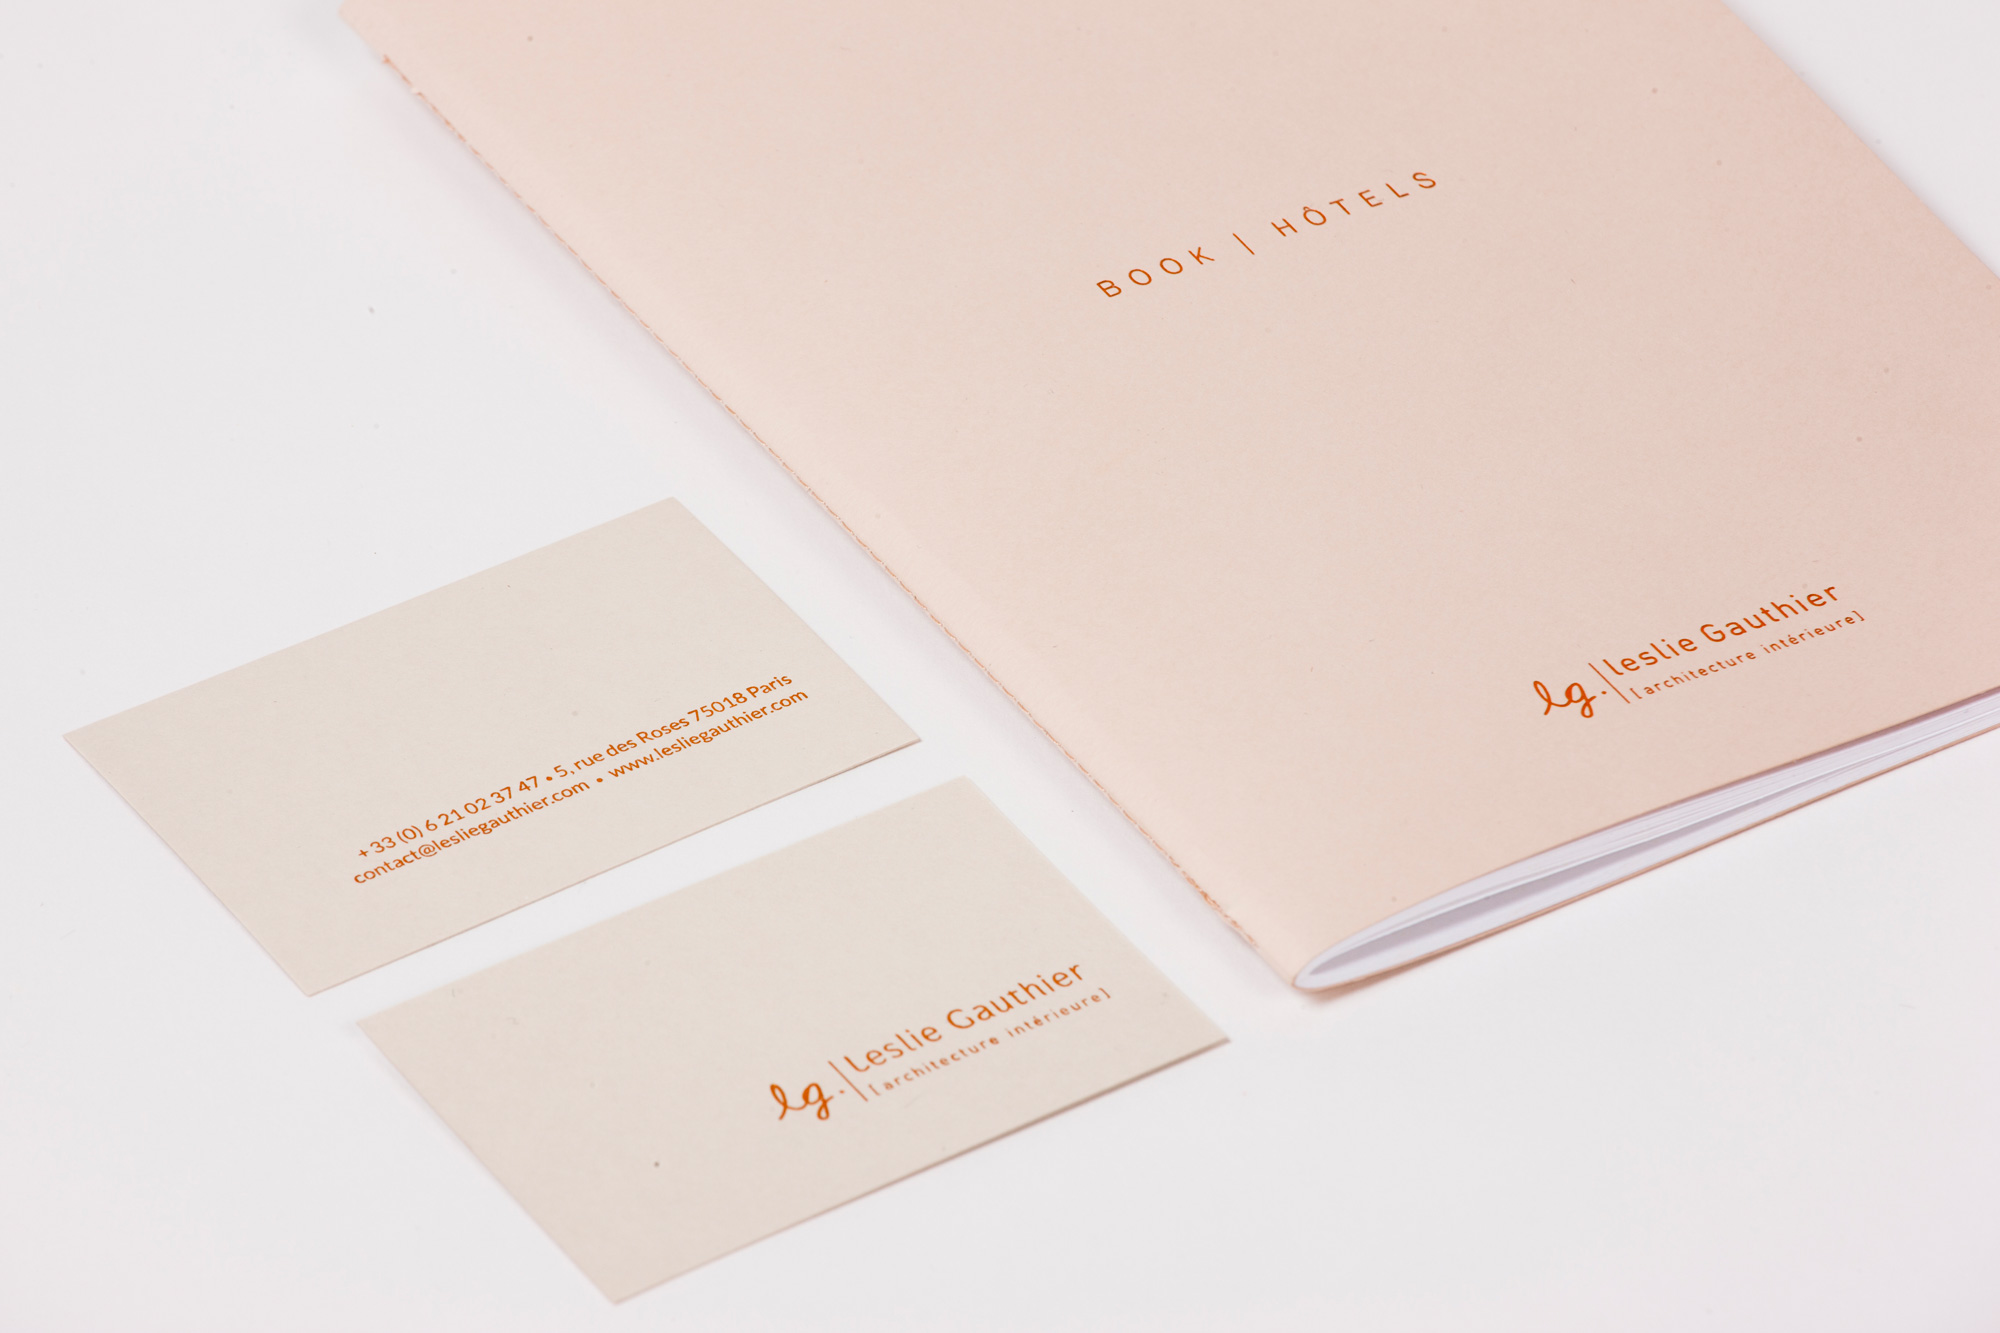 edition book cartes de visite